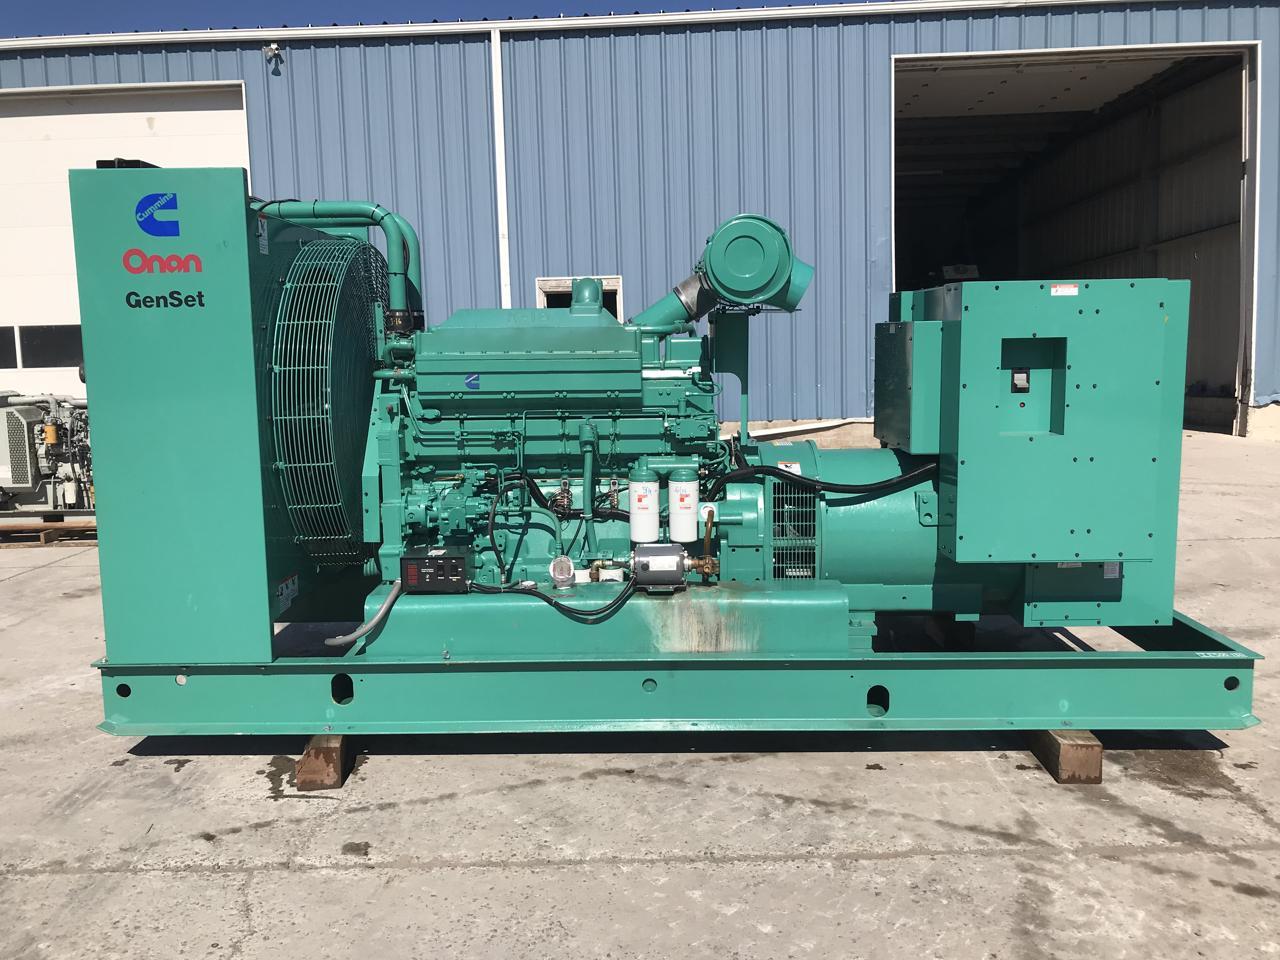 _500 kW Cummins Onan Generator Set, 1997, Base Fuel Tank, 12 Lead  Reconnectable